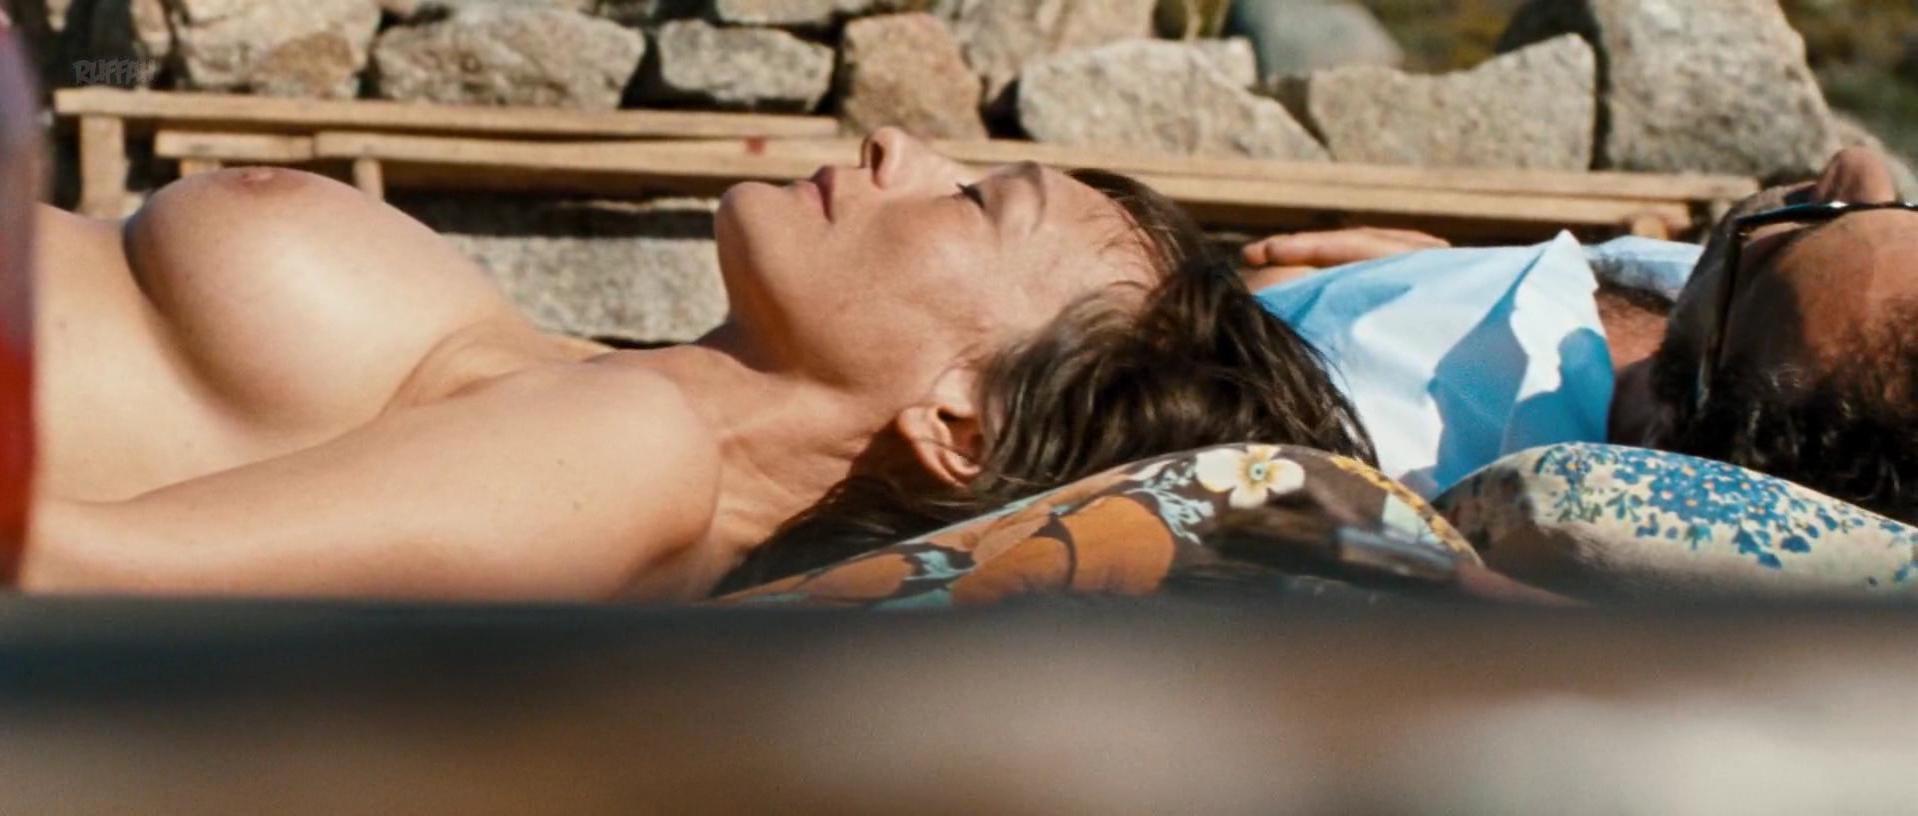 Marine Sainsily nude, Elina Lowensohn nude - Laissez Bronzer les Cadavres (2017)